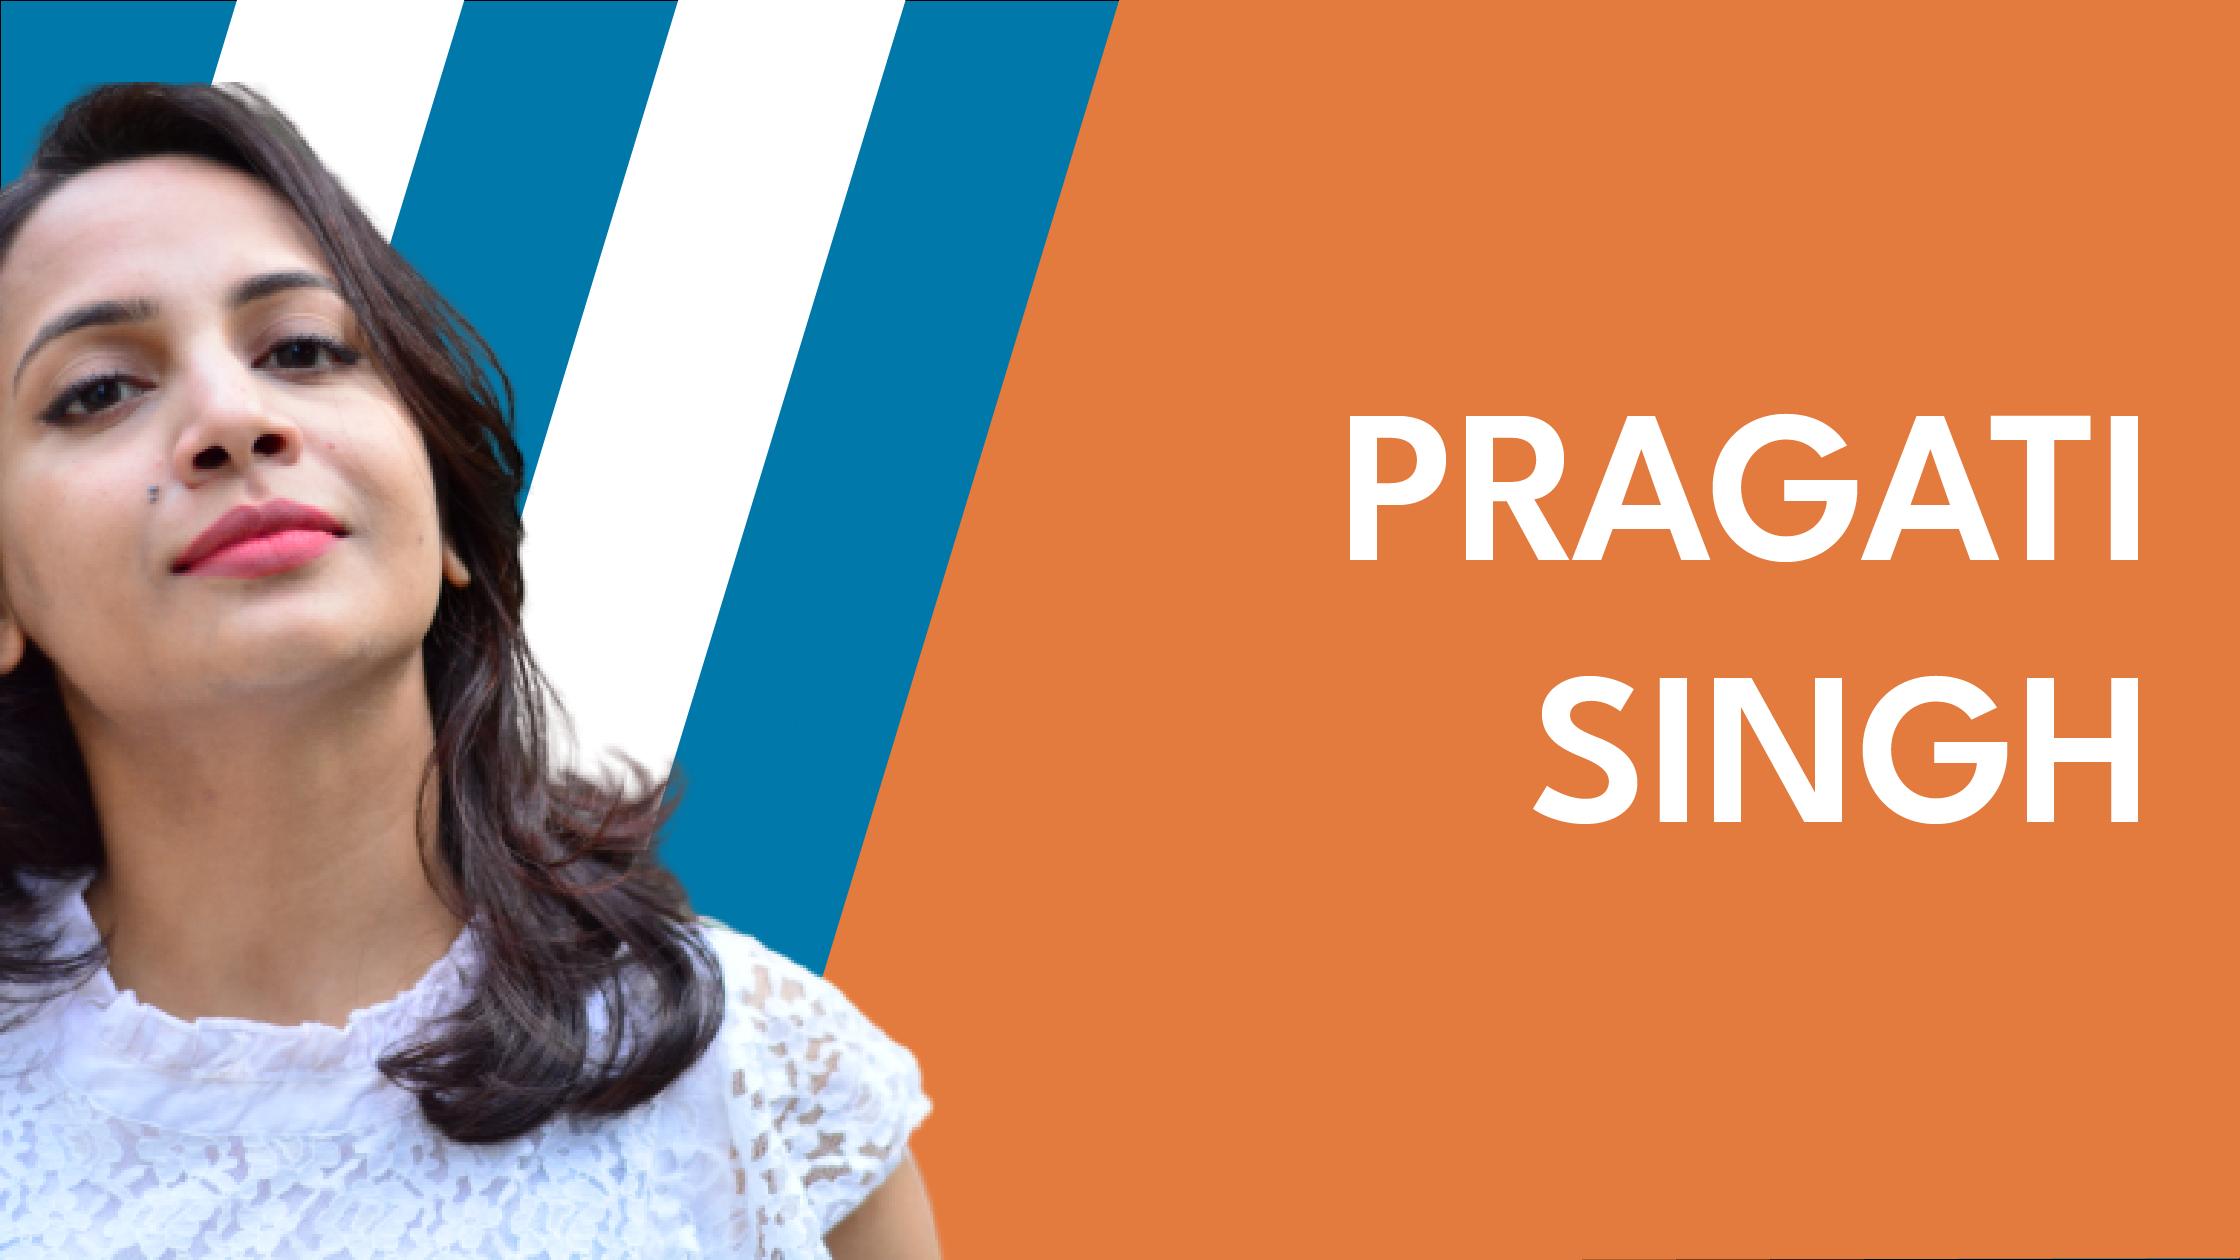 Pragati Singh